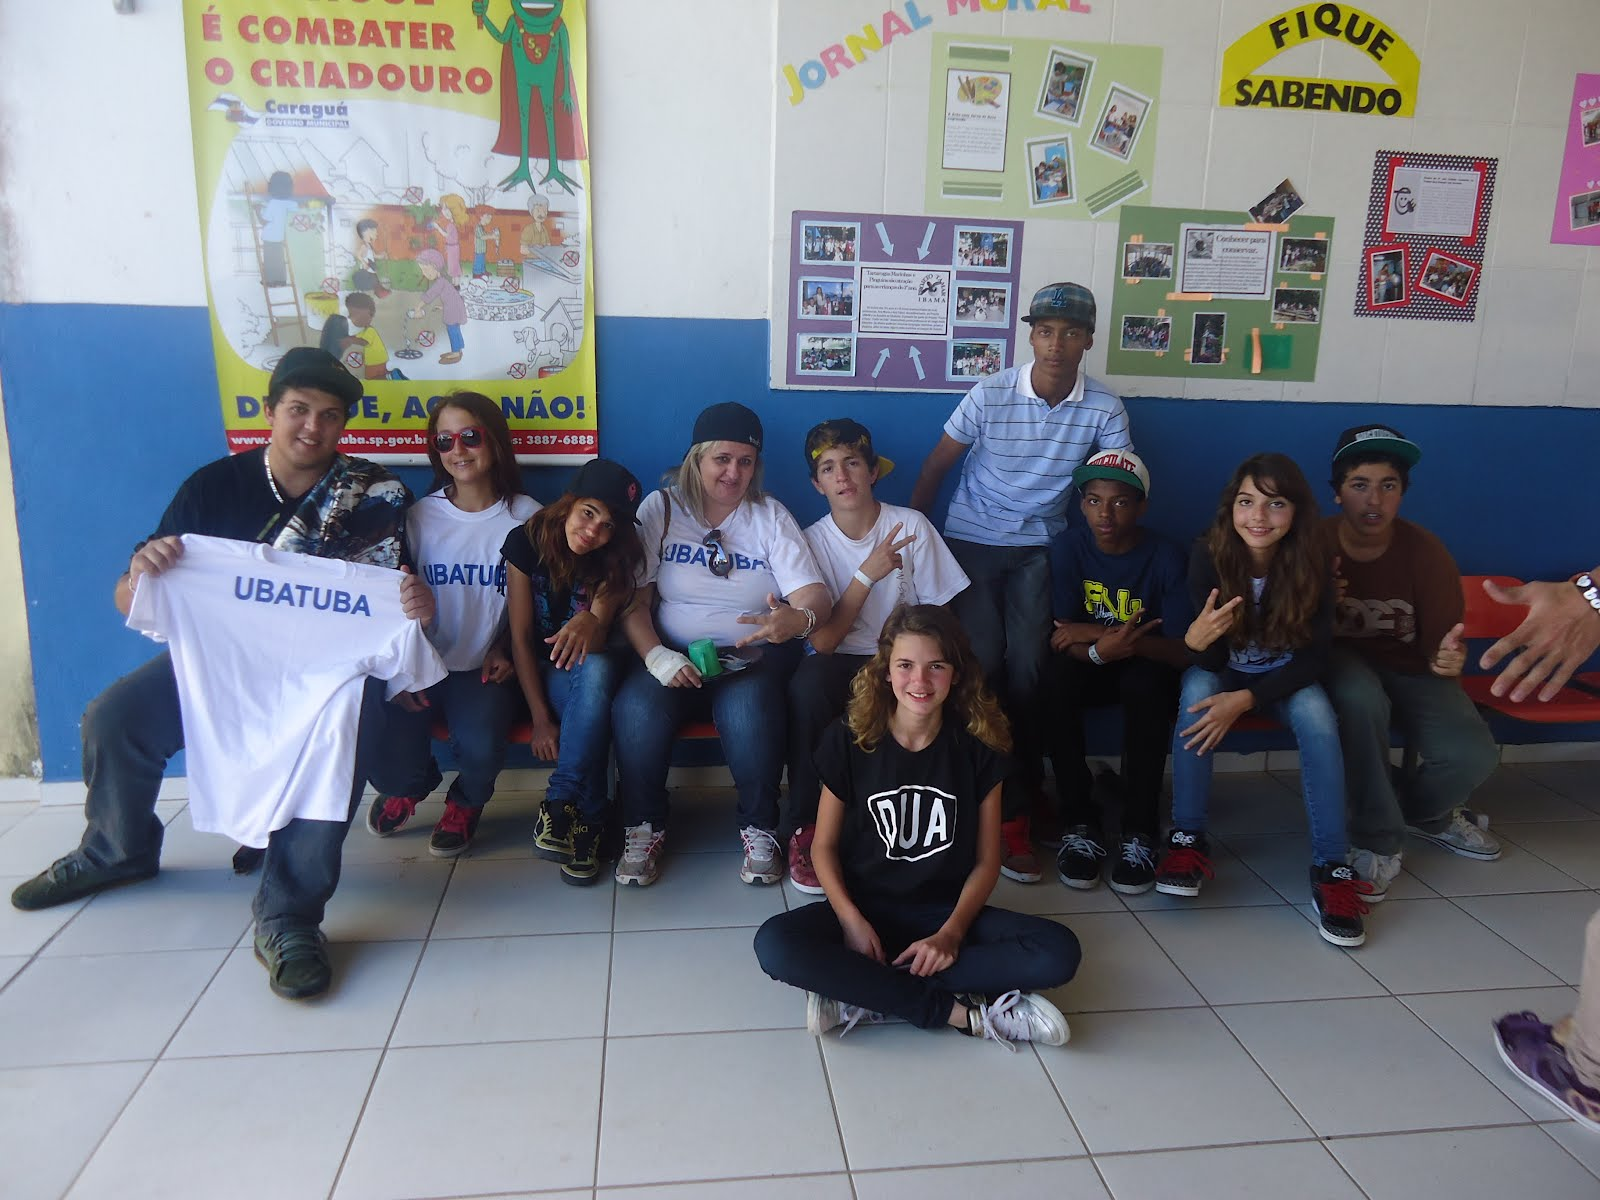 #JOGOSREGIONAIS #CARAGUÁ #2012